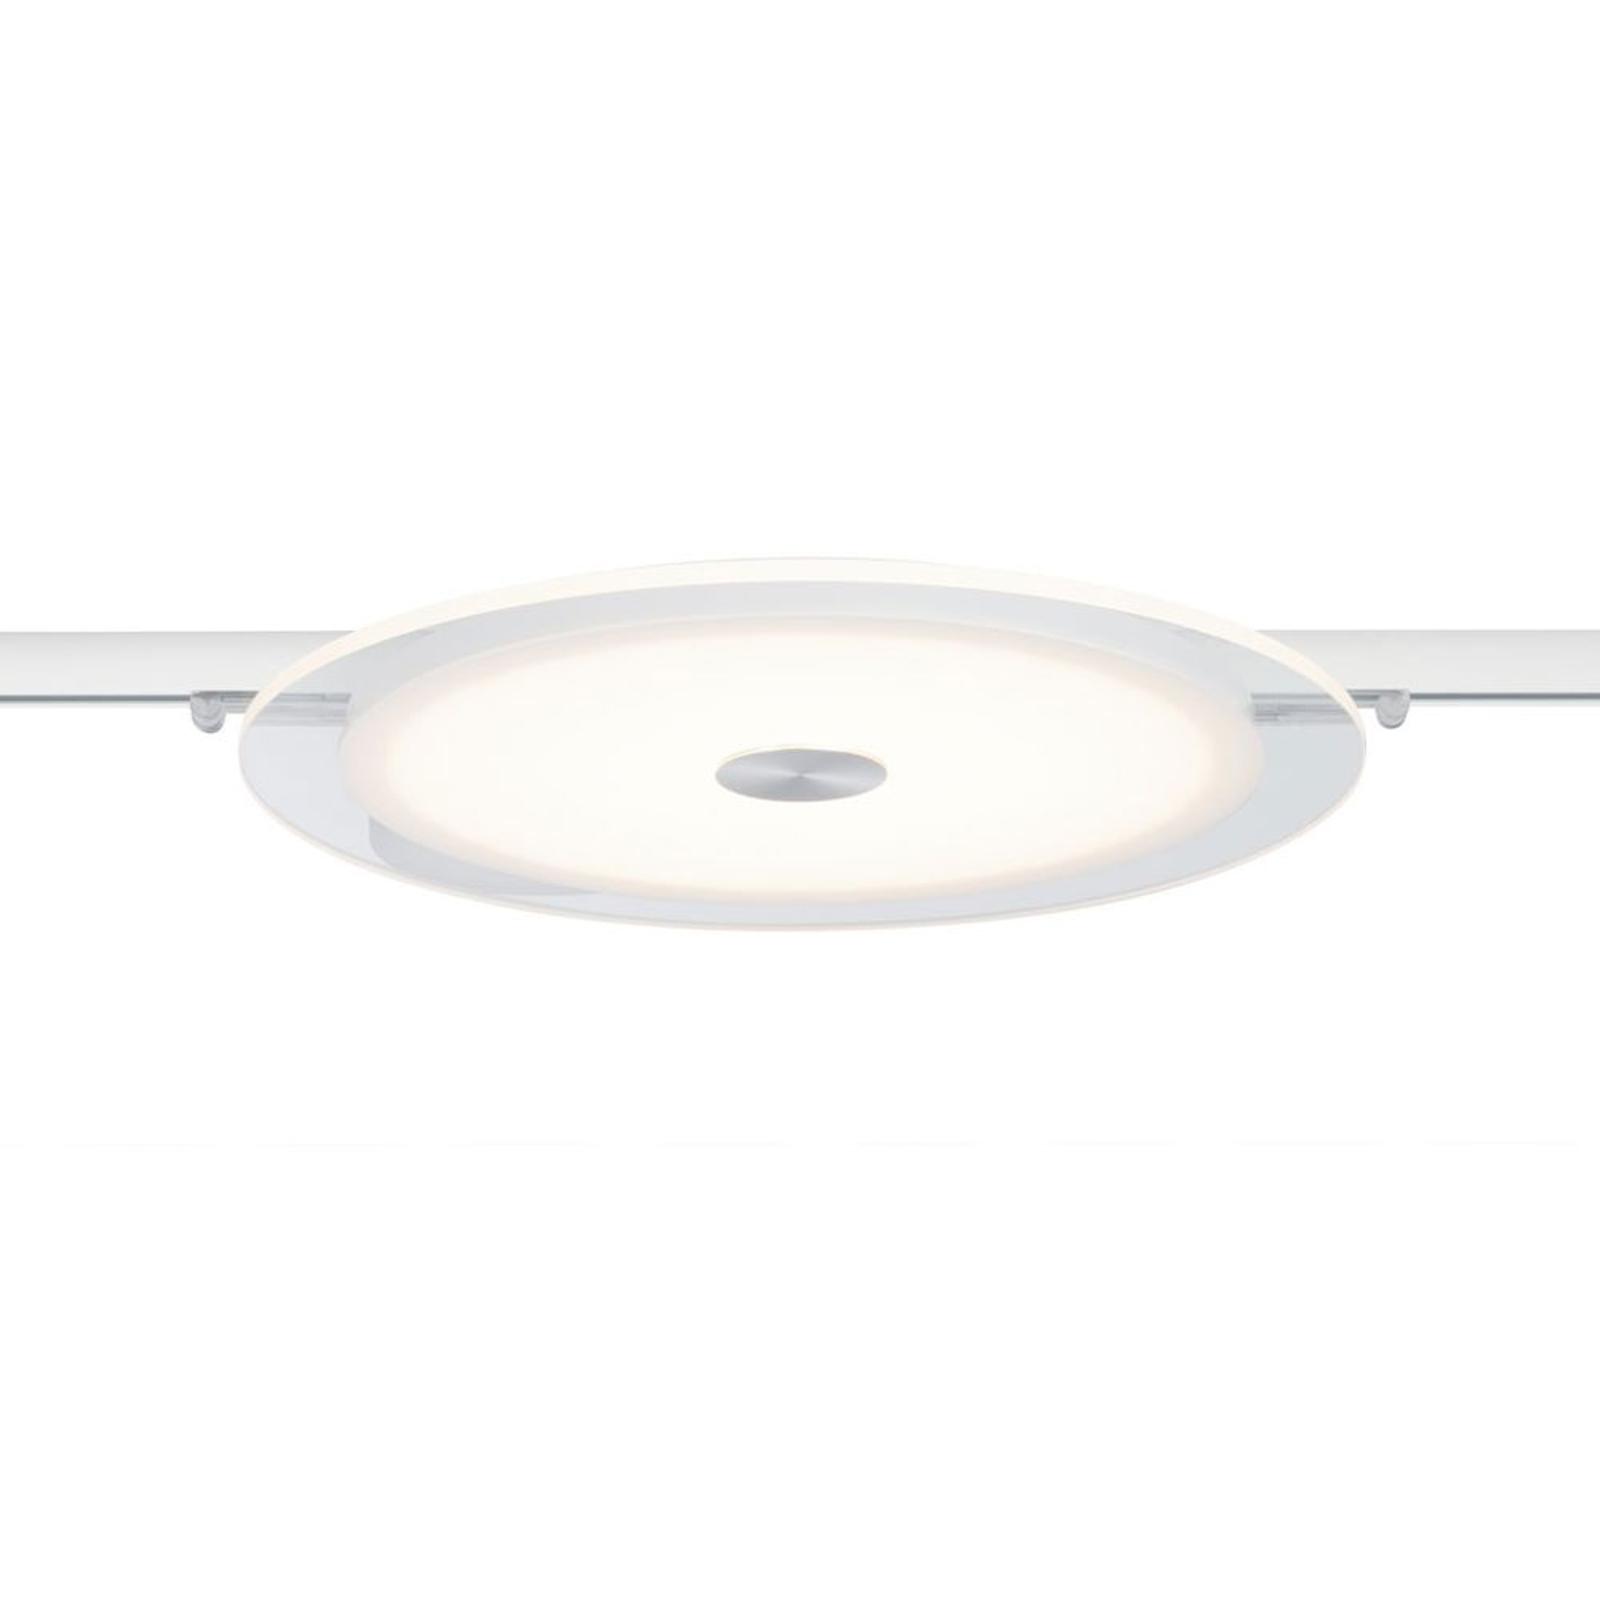 Paulmann NanoRail Luno LED-panel, hvit